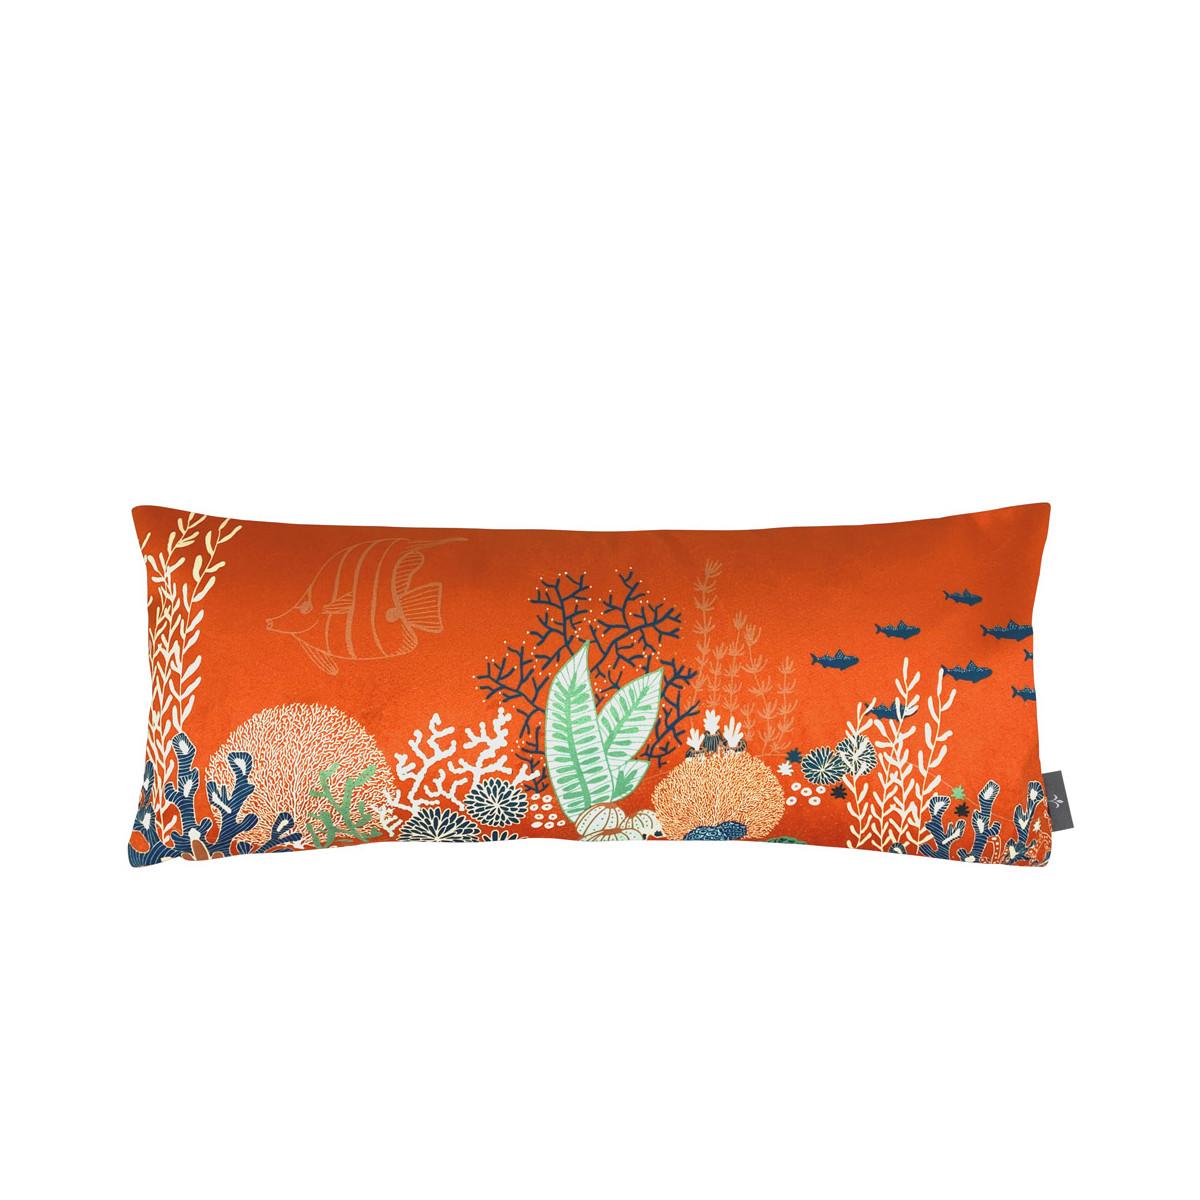 Coussin imprimé la jungle marine orange 25x60